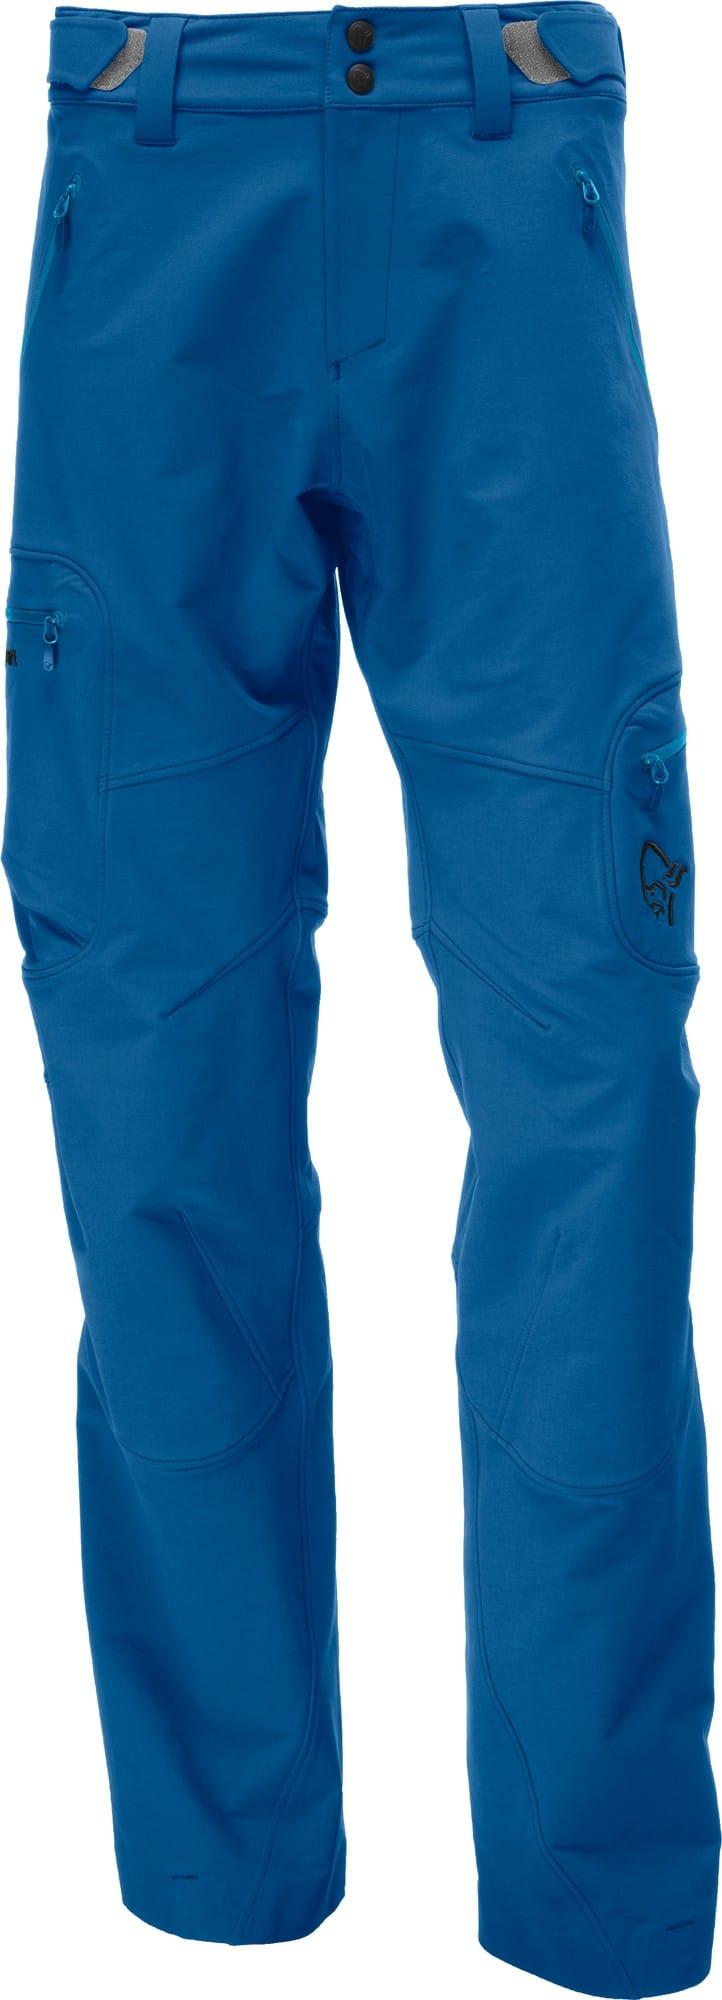 Norrona M Svalbard Flex1 Pants | Größe S,M,L,XL,XXL | Herren Hose